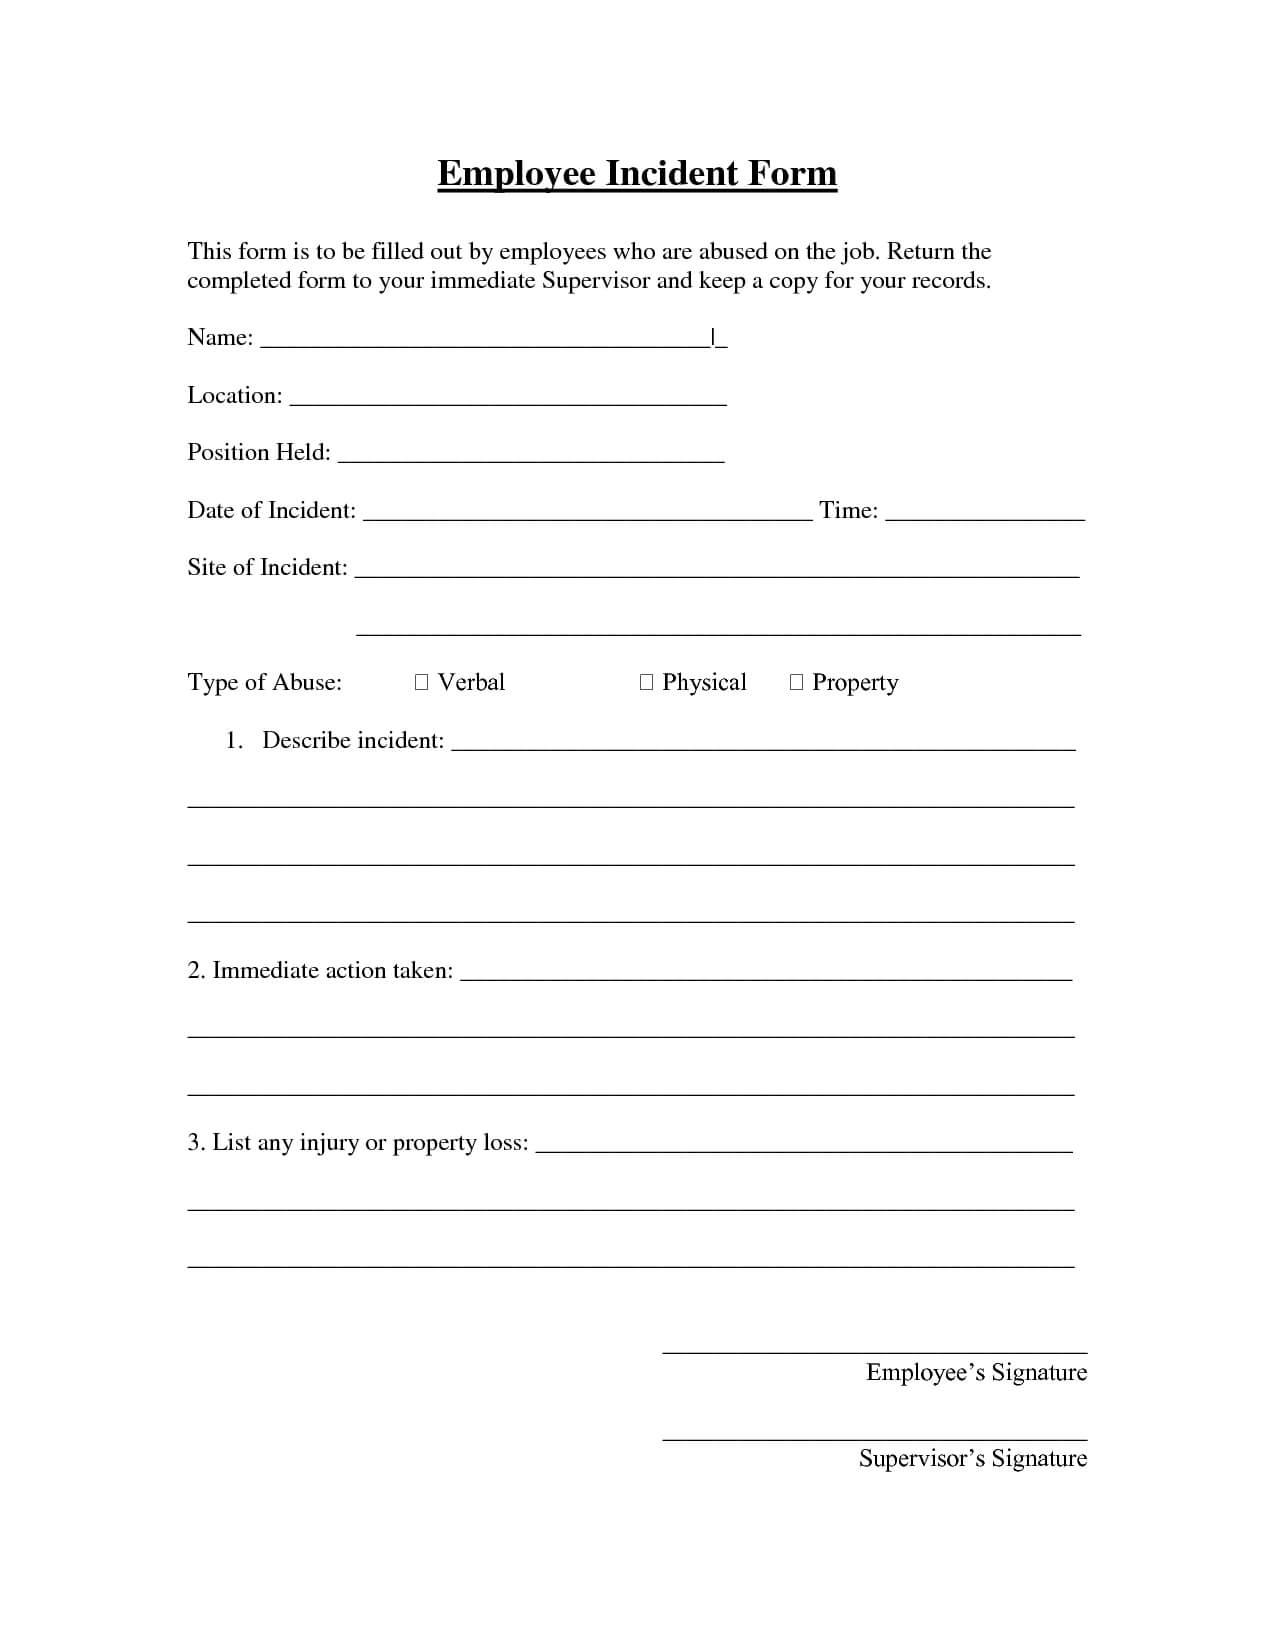 005 Employee Incident Report Form Template 290707 Top Ideas regarding Incident Hazard Report Form Template